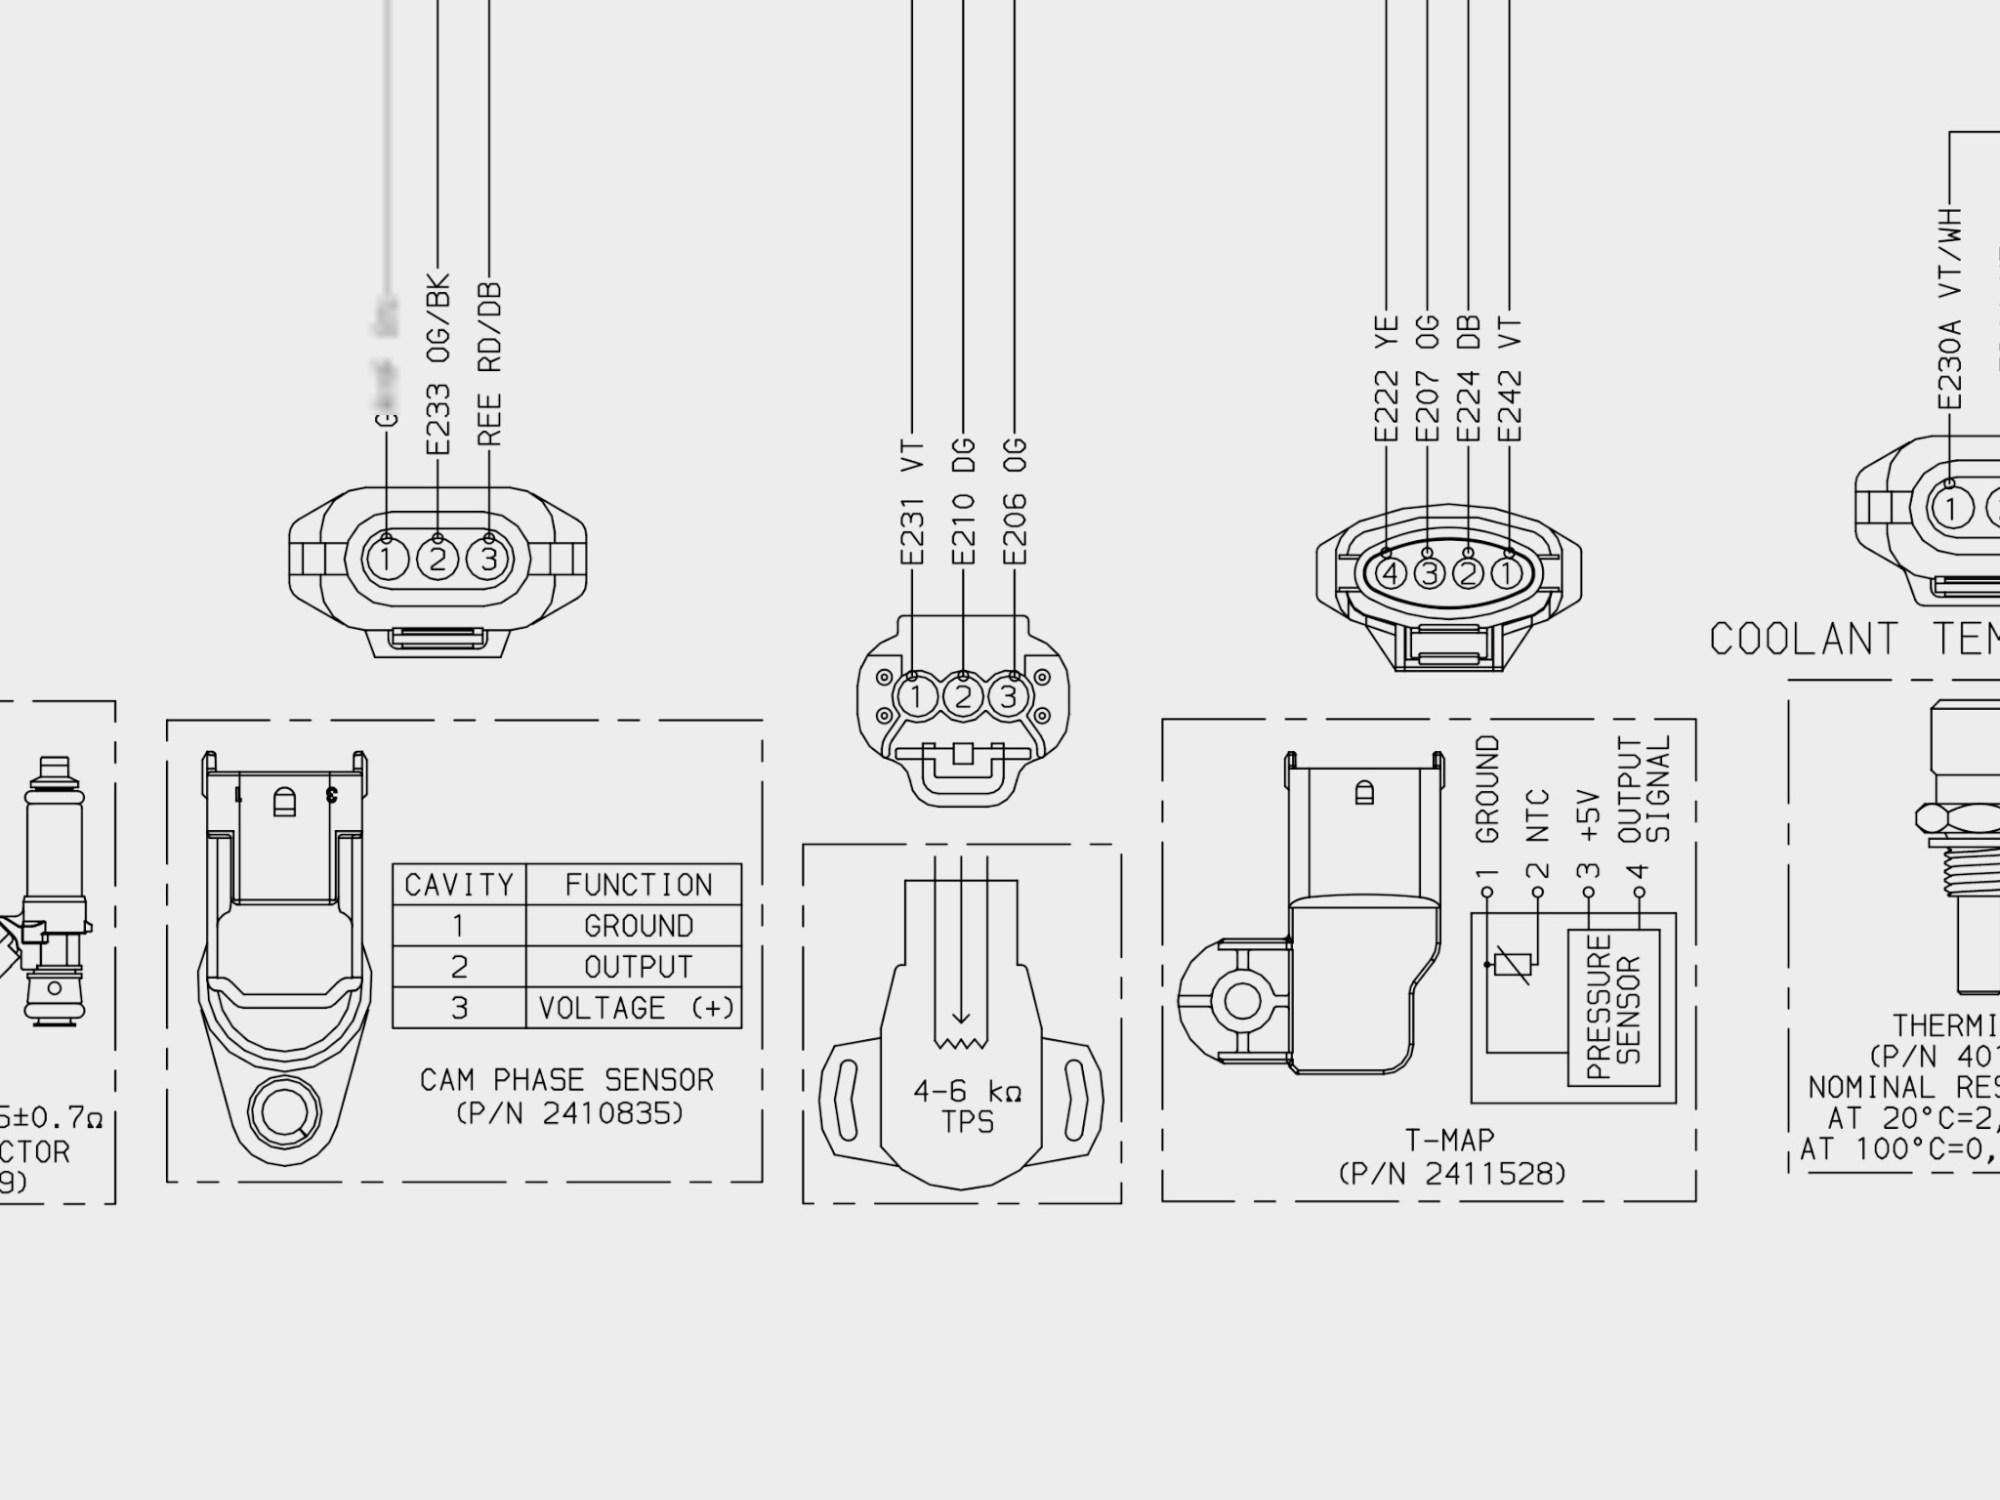 hight resolution of  2013 ranger 800 tps adjustment on polaris 500 schematic 2007 polaris ranger wiring diagram